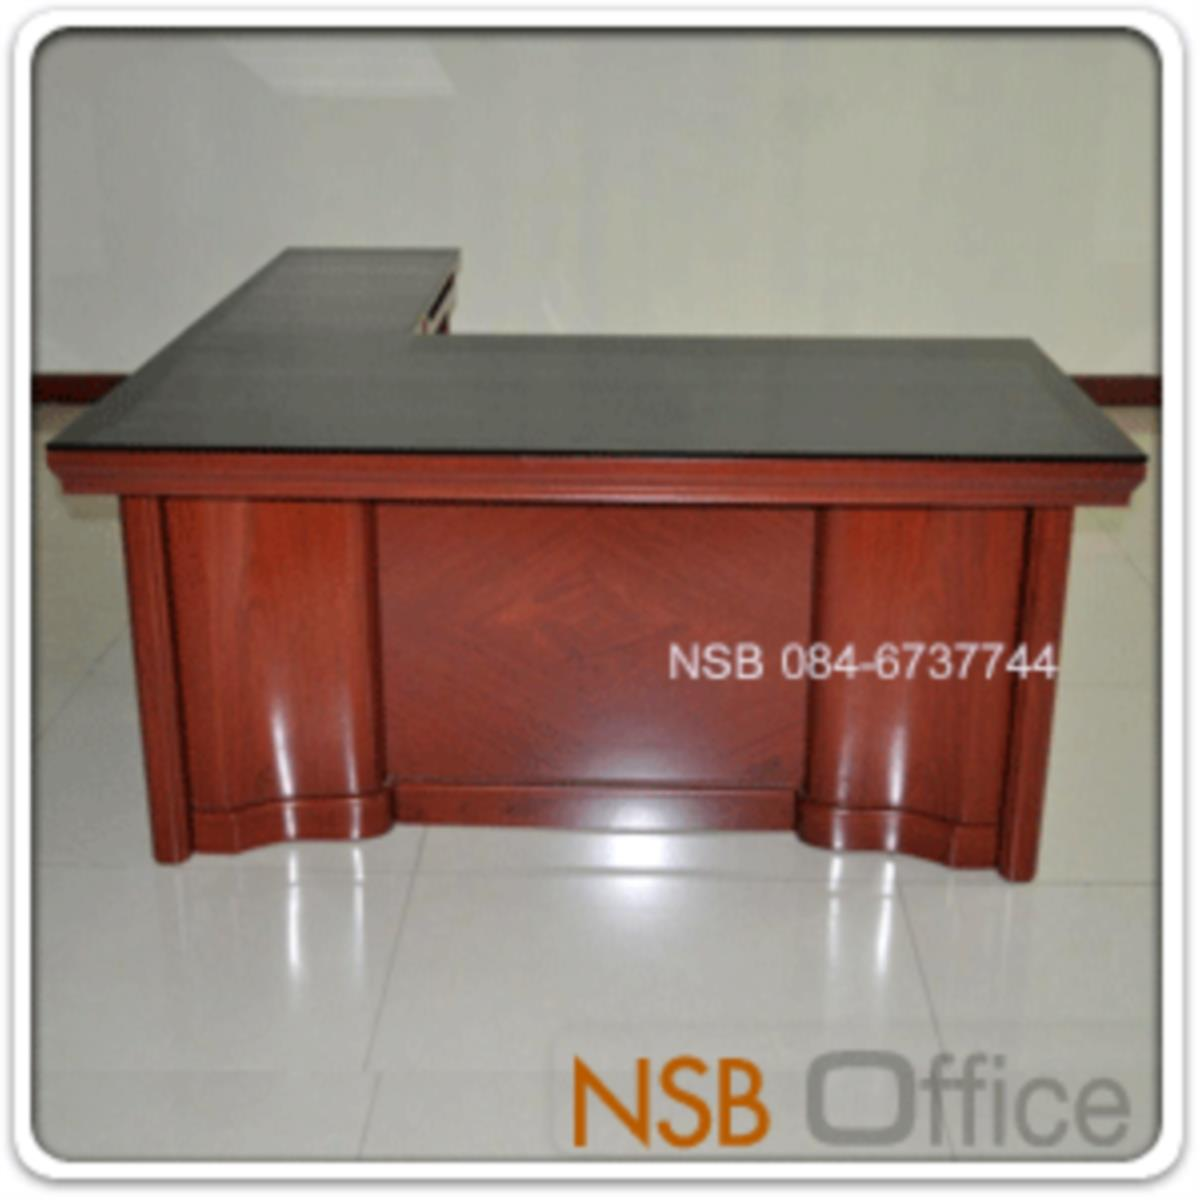 A06A083:โต๊ะบริหารตัวแอล มีกระจกหน้าโต๊ะ รุ่น Farnsworth (ฟาร์นสเวิร์ธ)  พร้อมตู้ข้าง และลิ้นชัก